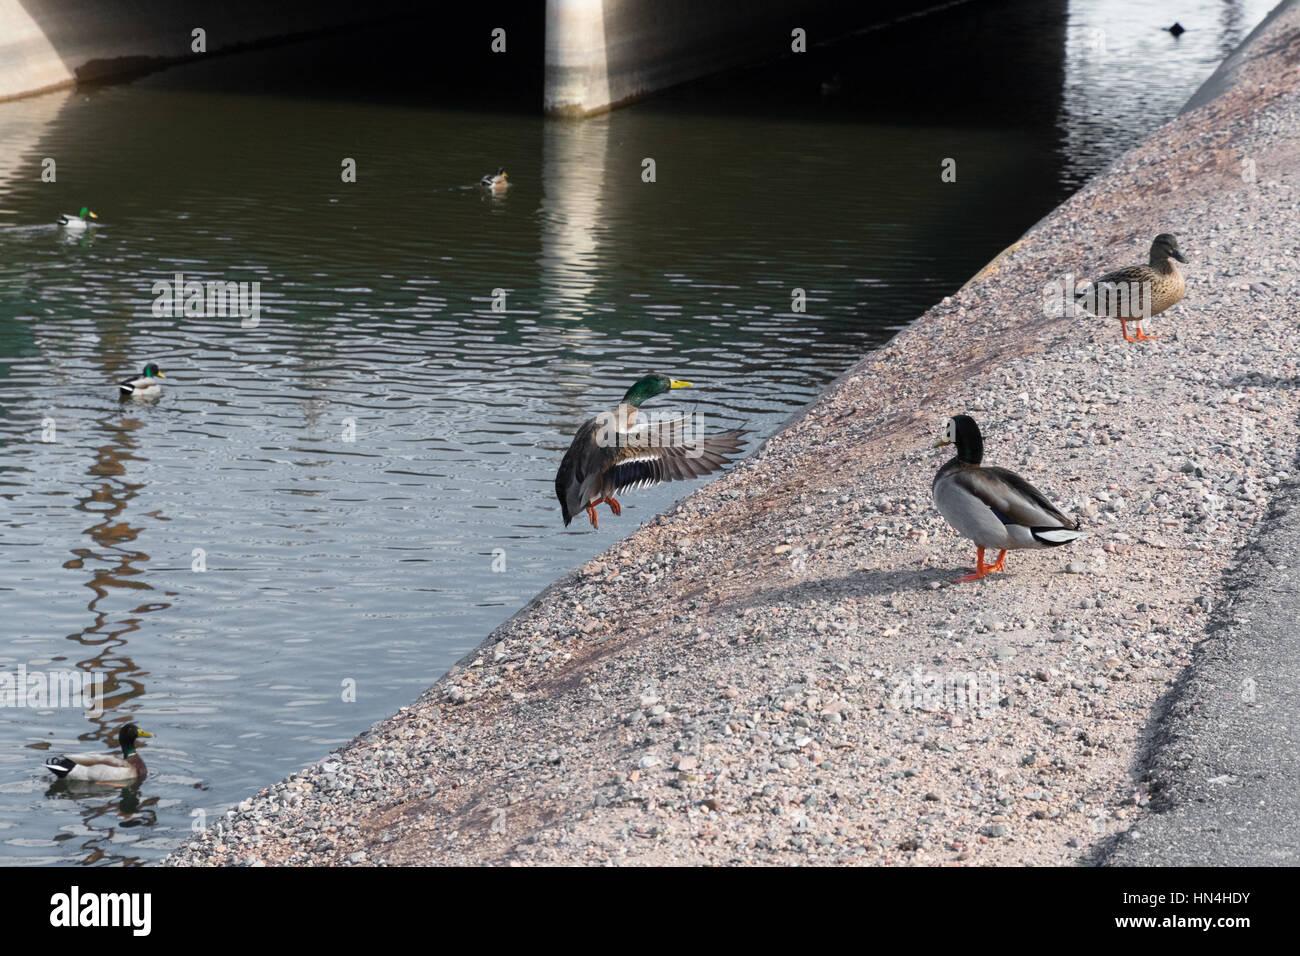 duck landing on shore grainy sharp image - Stock Image